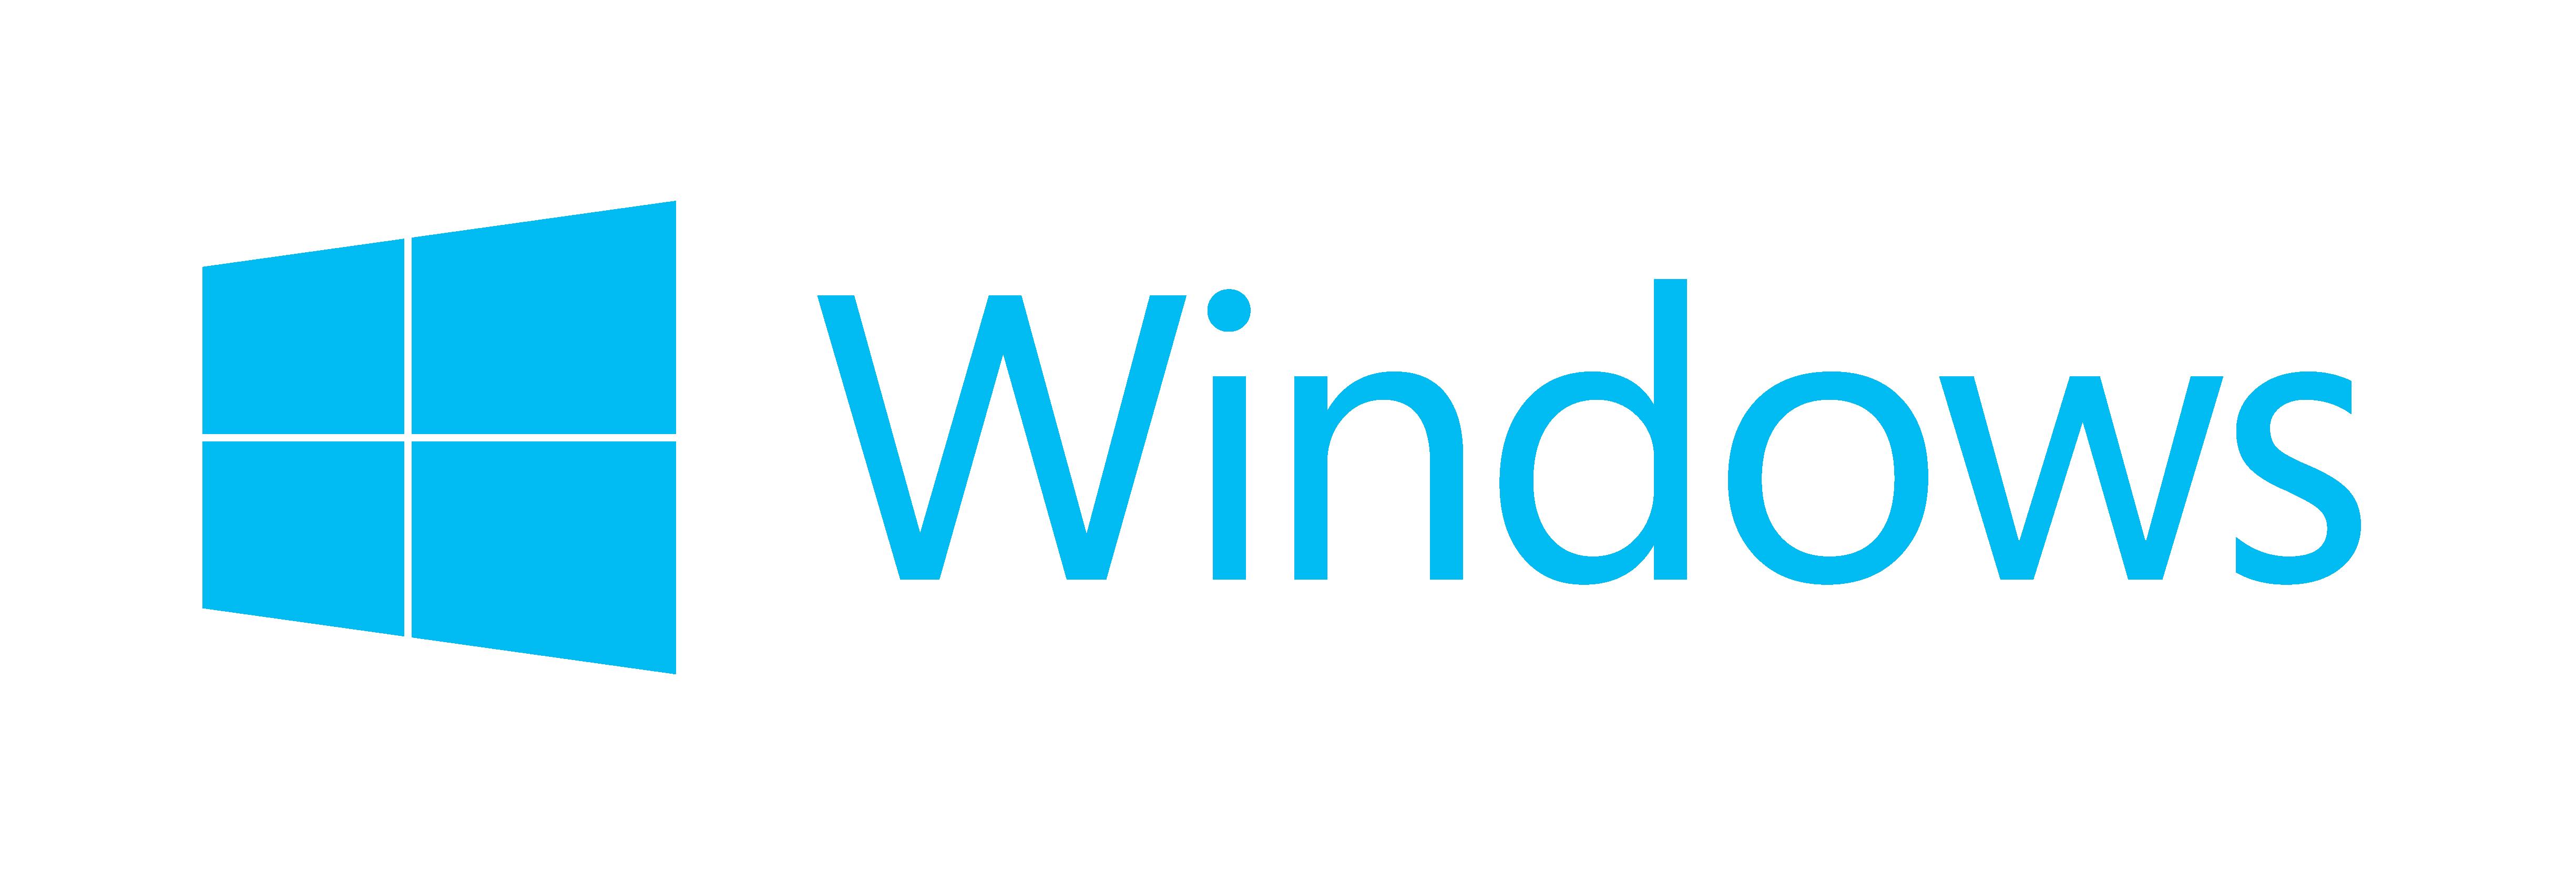 Microsoft Windows 10 PNG - 35618